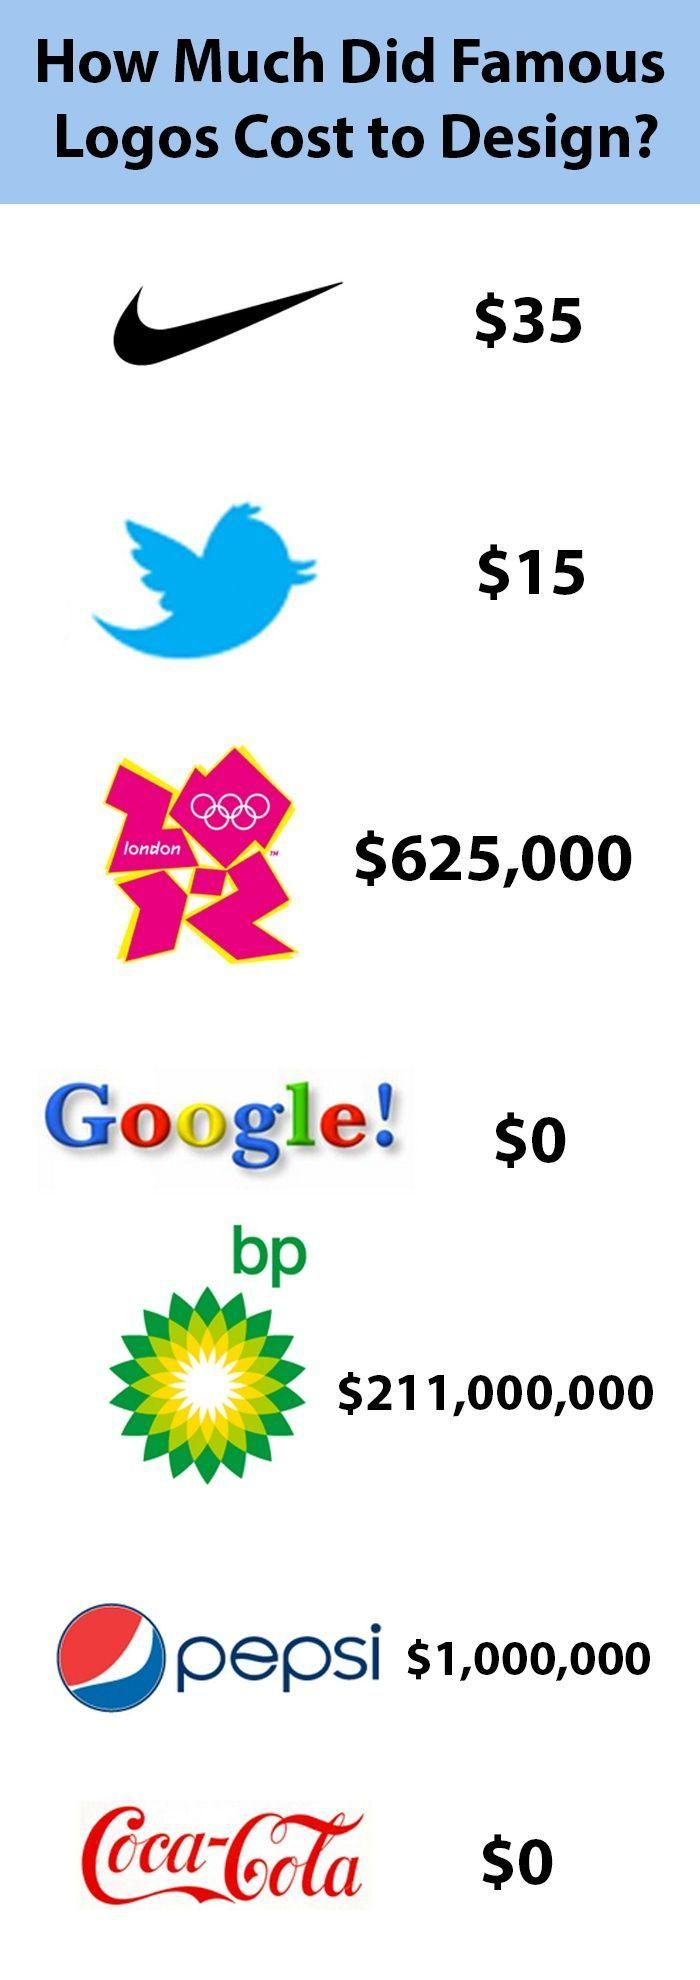 Famous logos and their design cost #marketing #logs #graphics www.lansingmarketinggroup.com